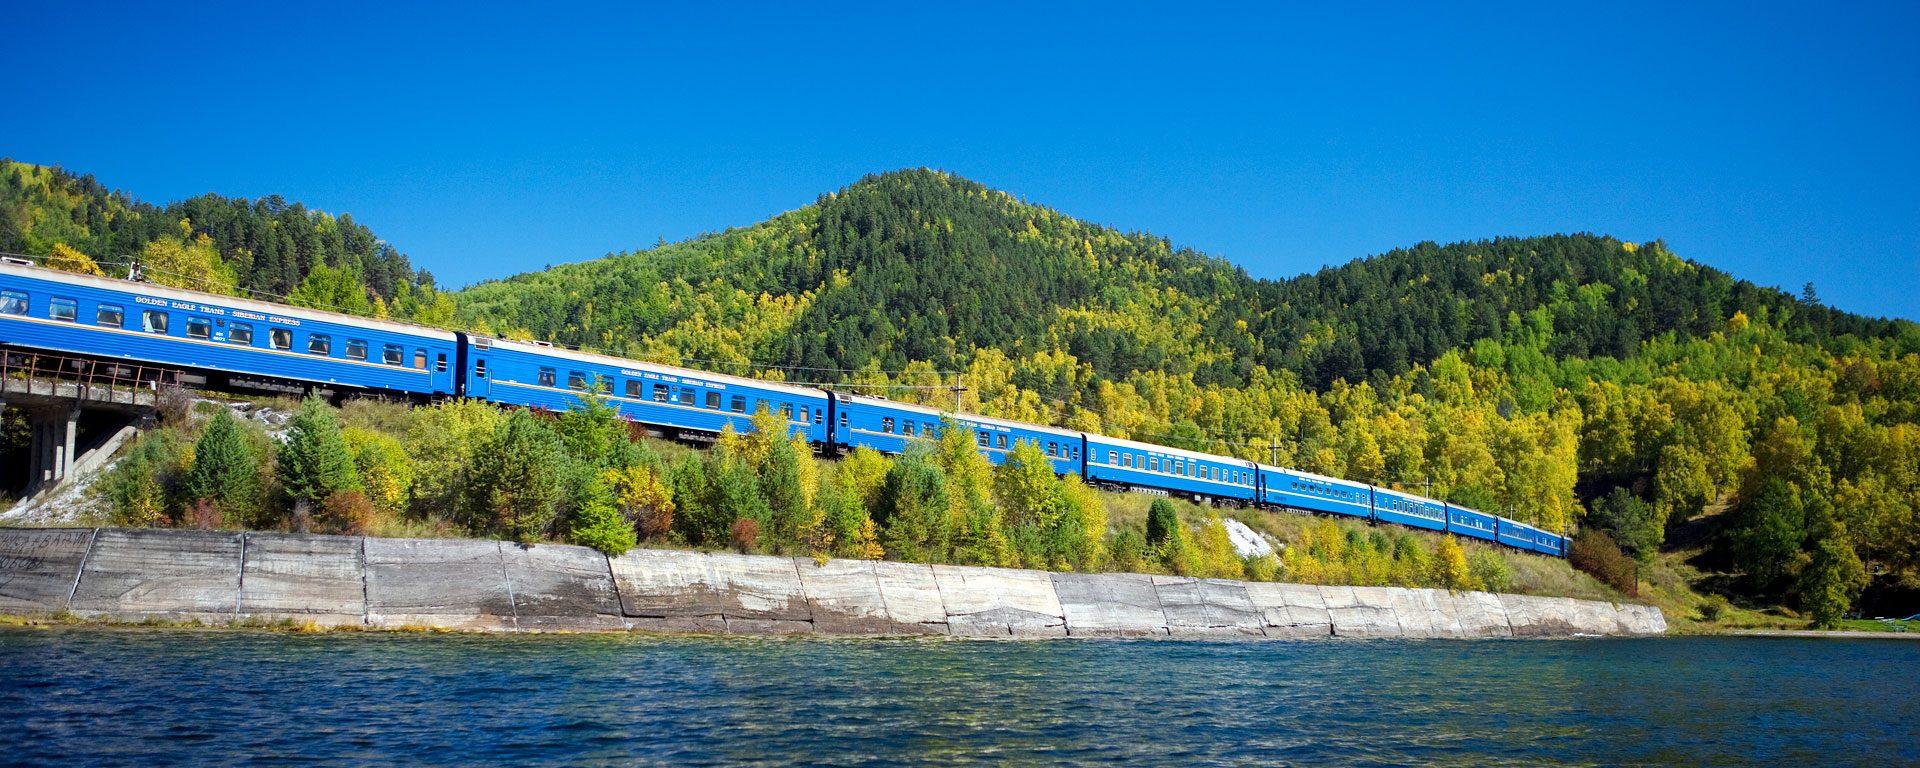 The Golden Eagle luxury train travels past Lake Baikal, Siberia, Russia